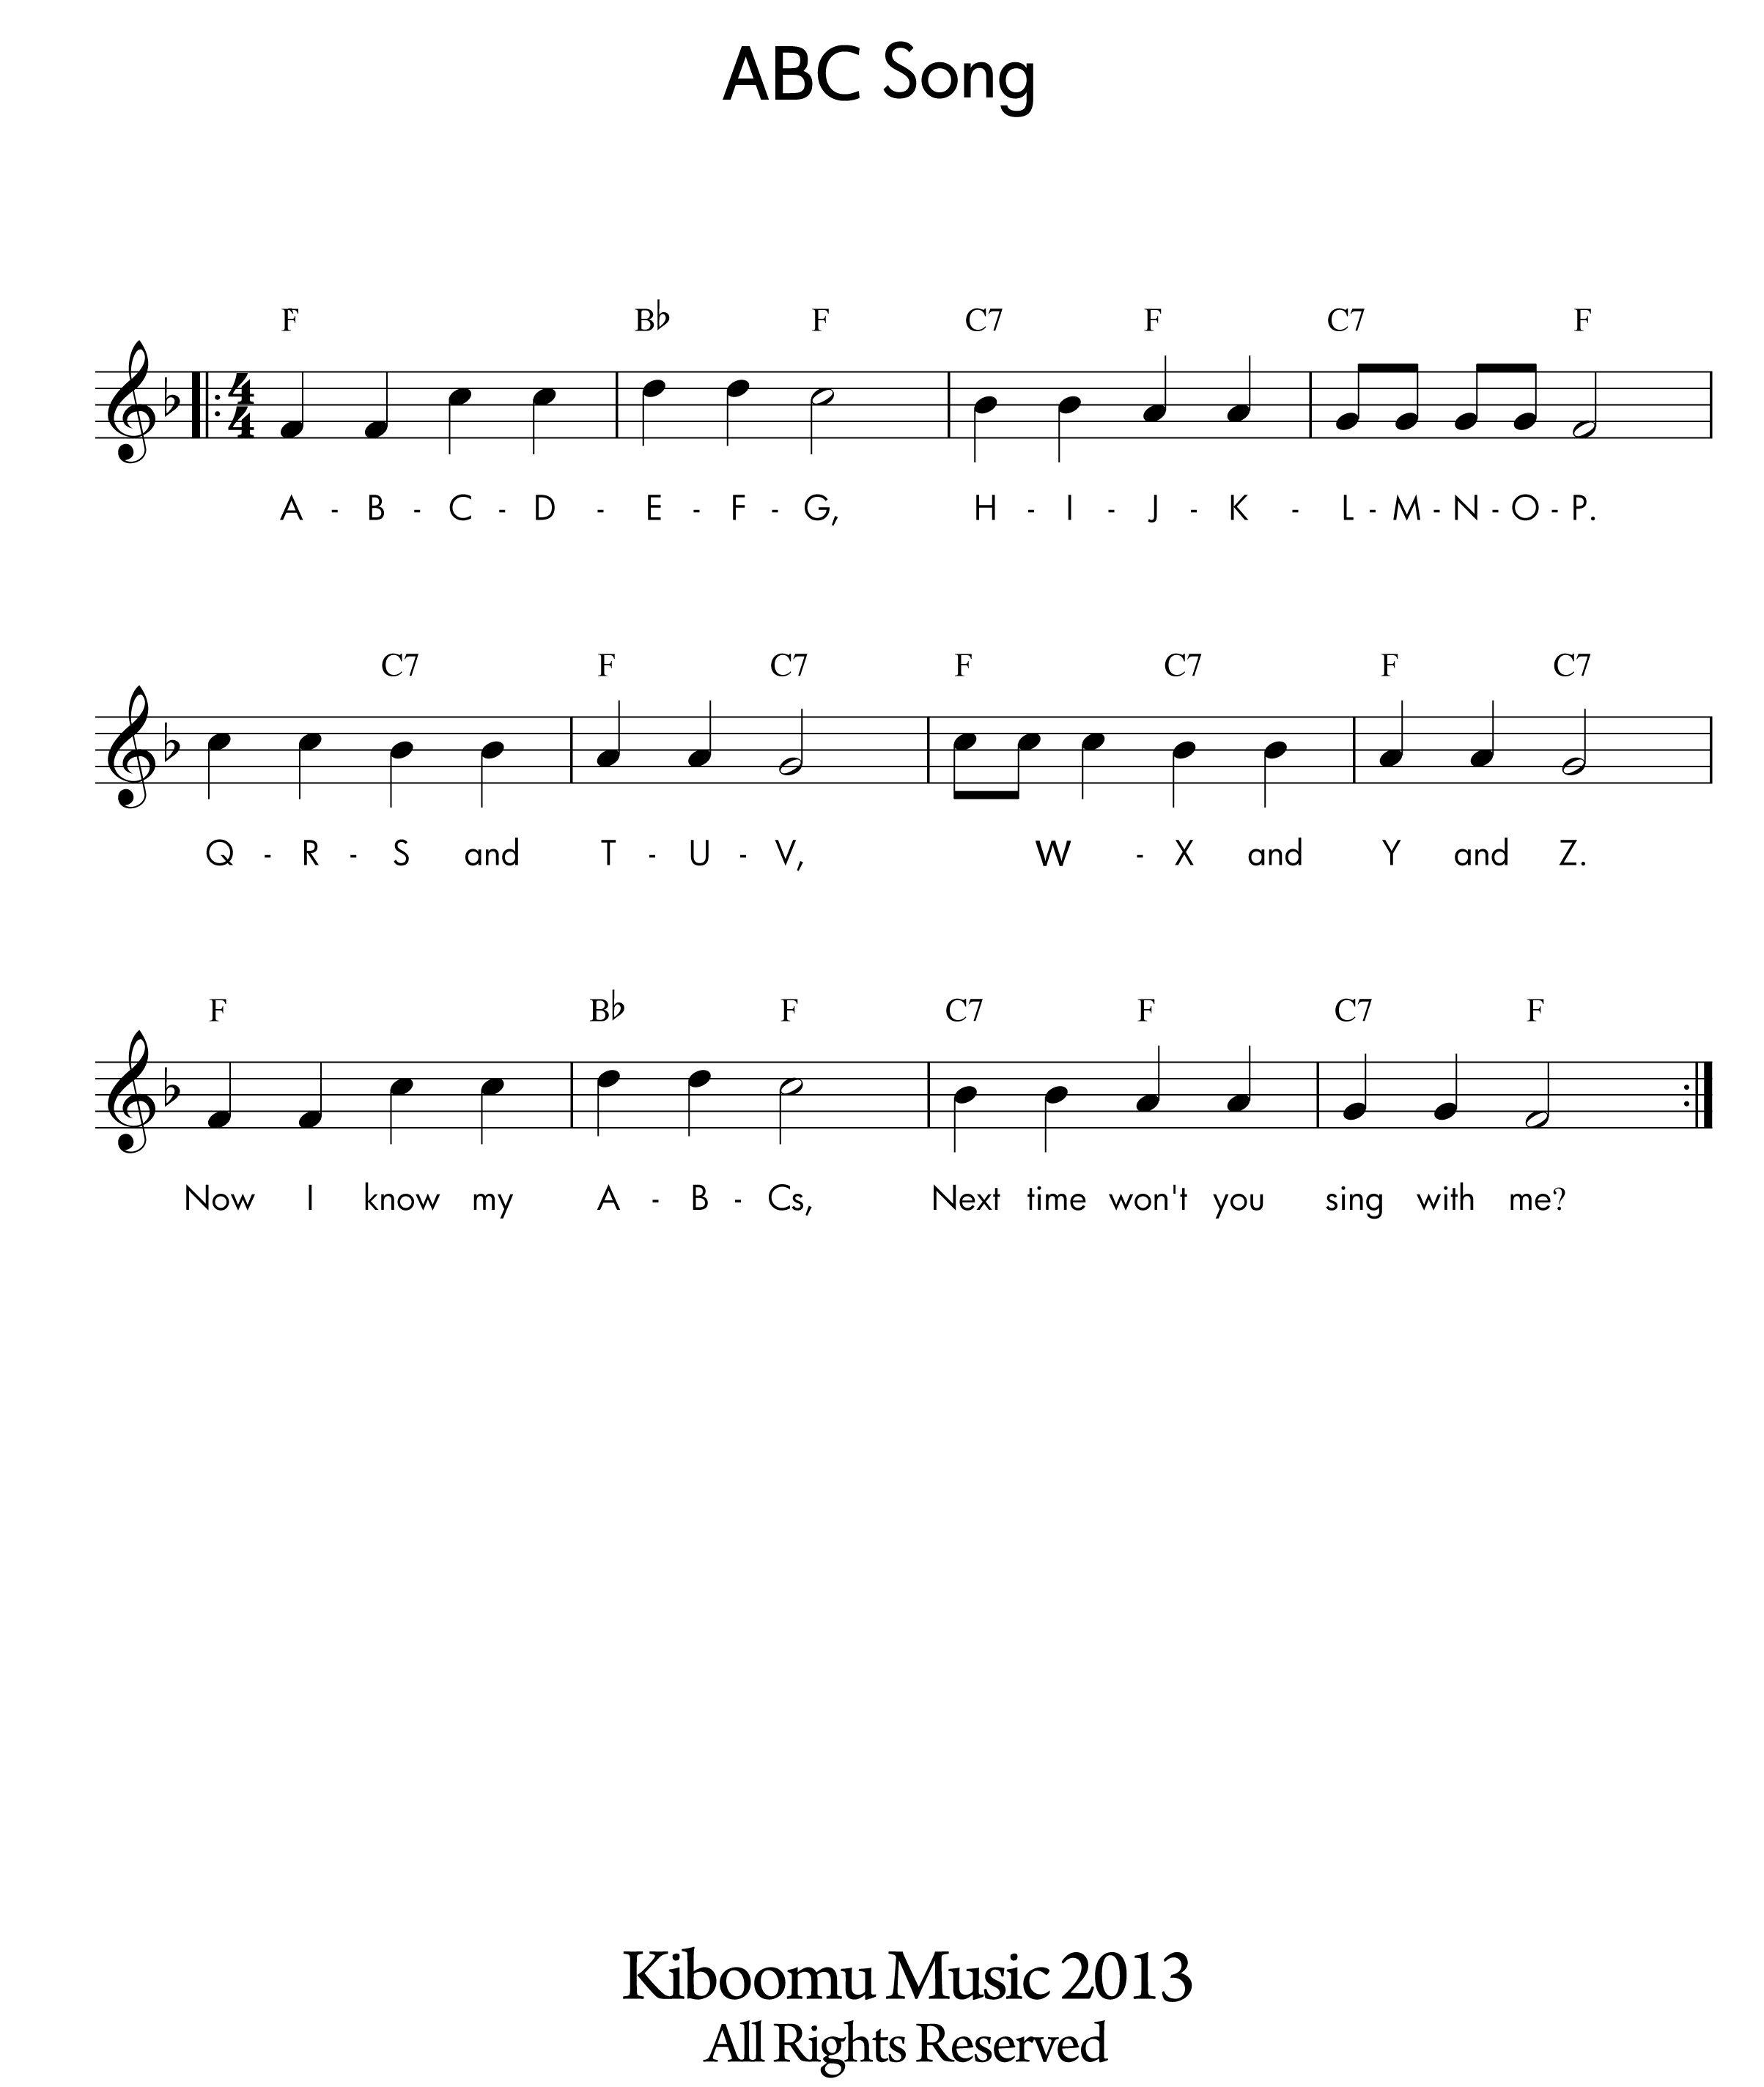 Abc Song Sheet Music At Kiboomu Kids Songs